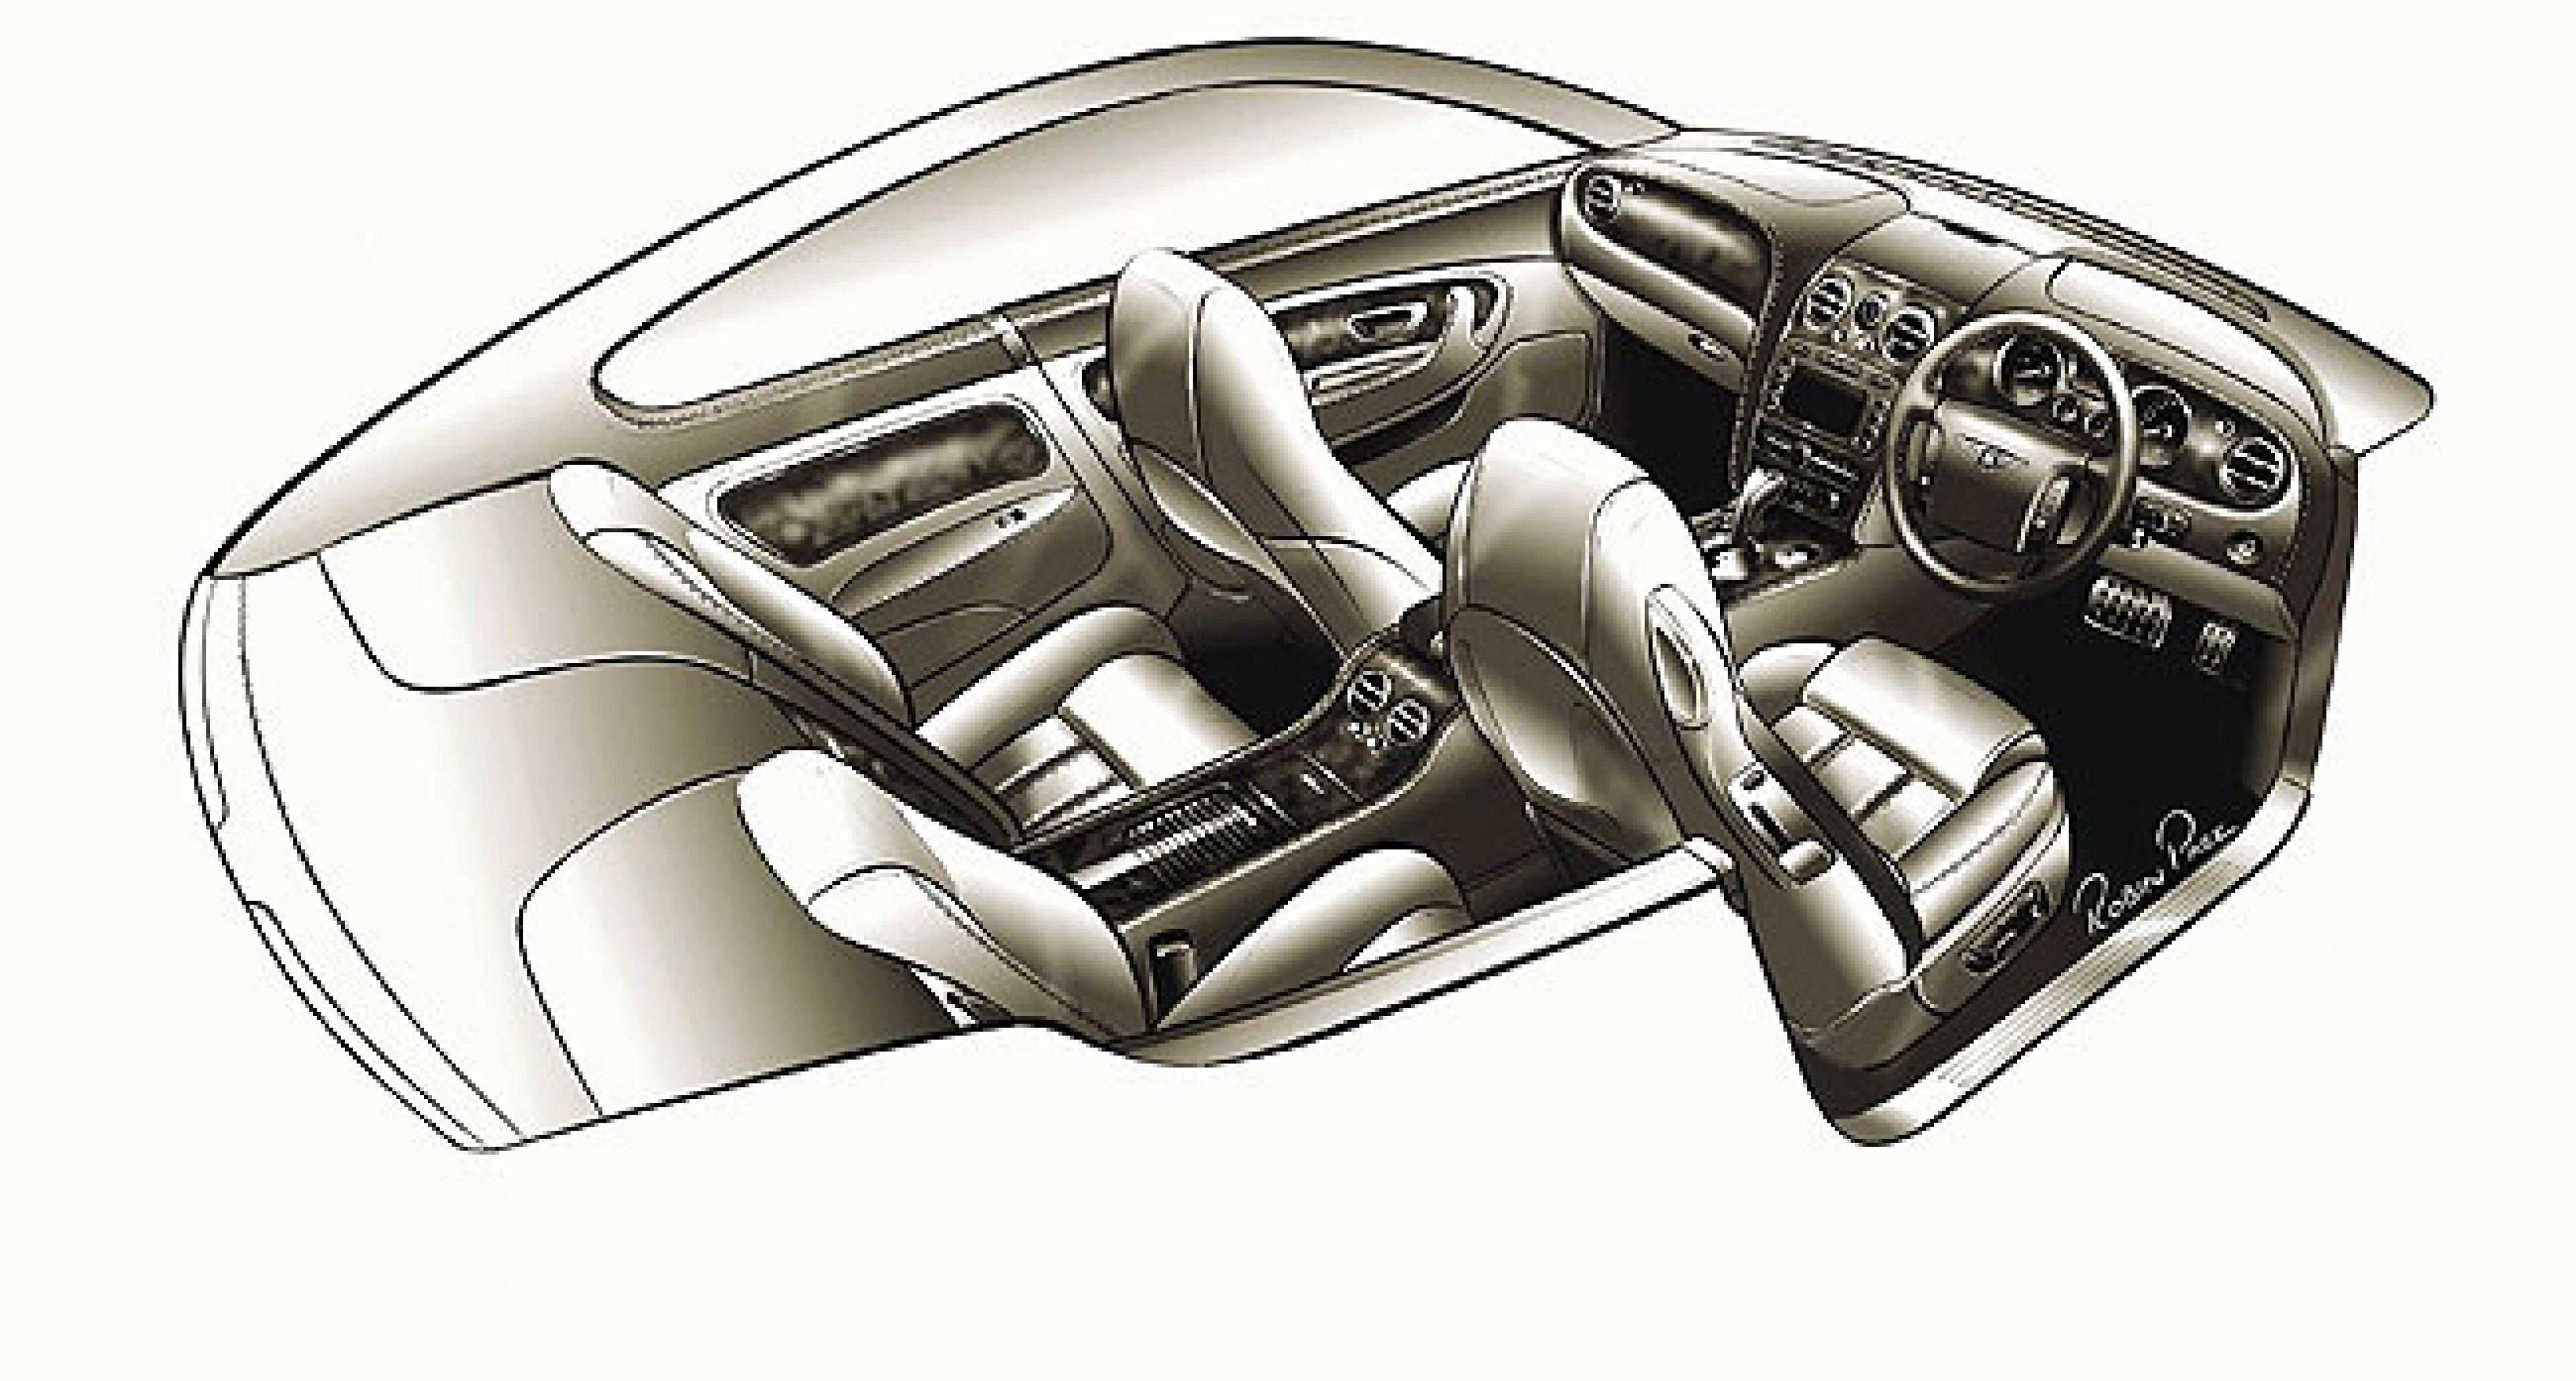 Bentley GT Coupé: Wiedergeburt des viersitzigen Grand Touring